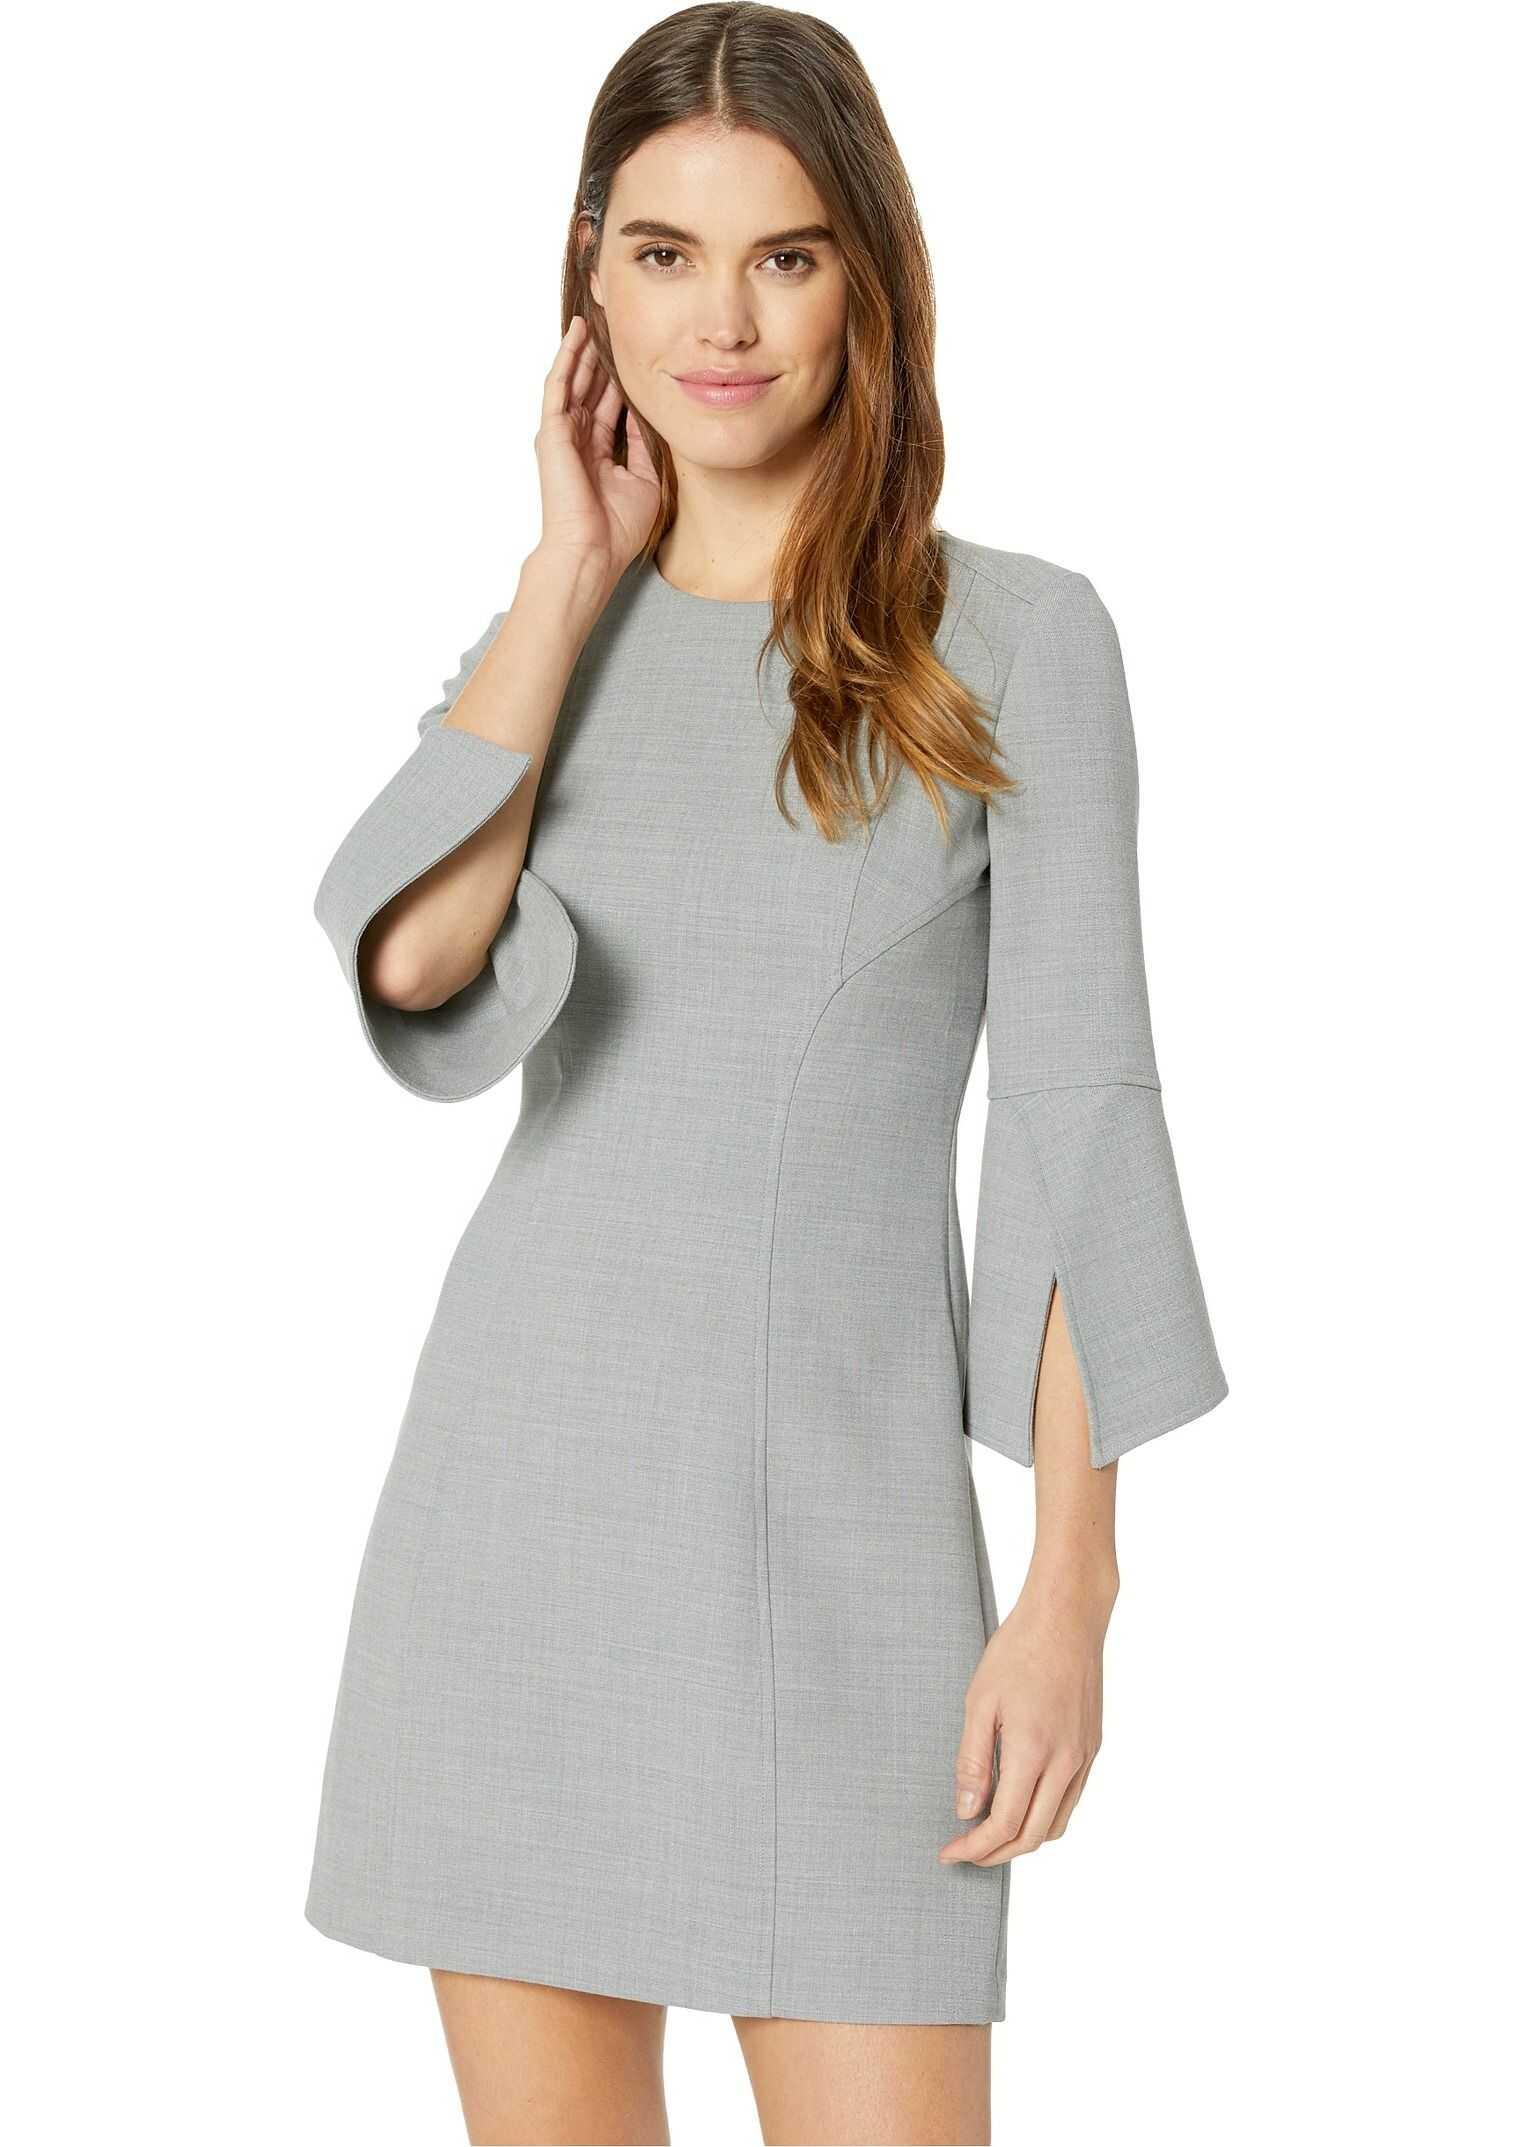 Badgley Mischka Split Sleeve Dress Heather Grey